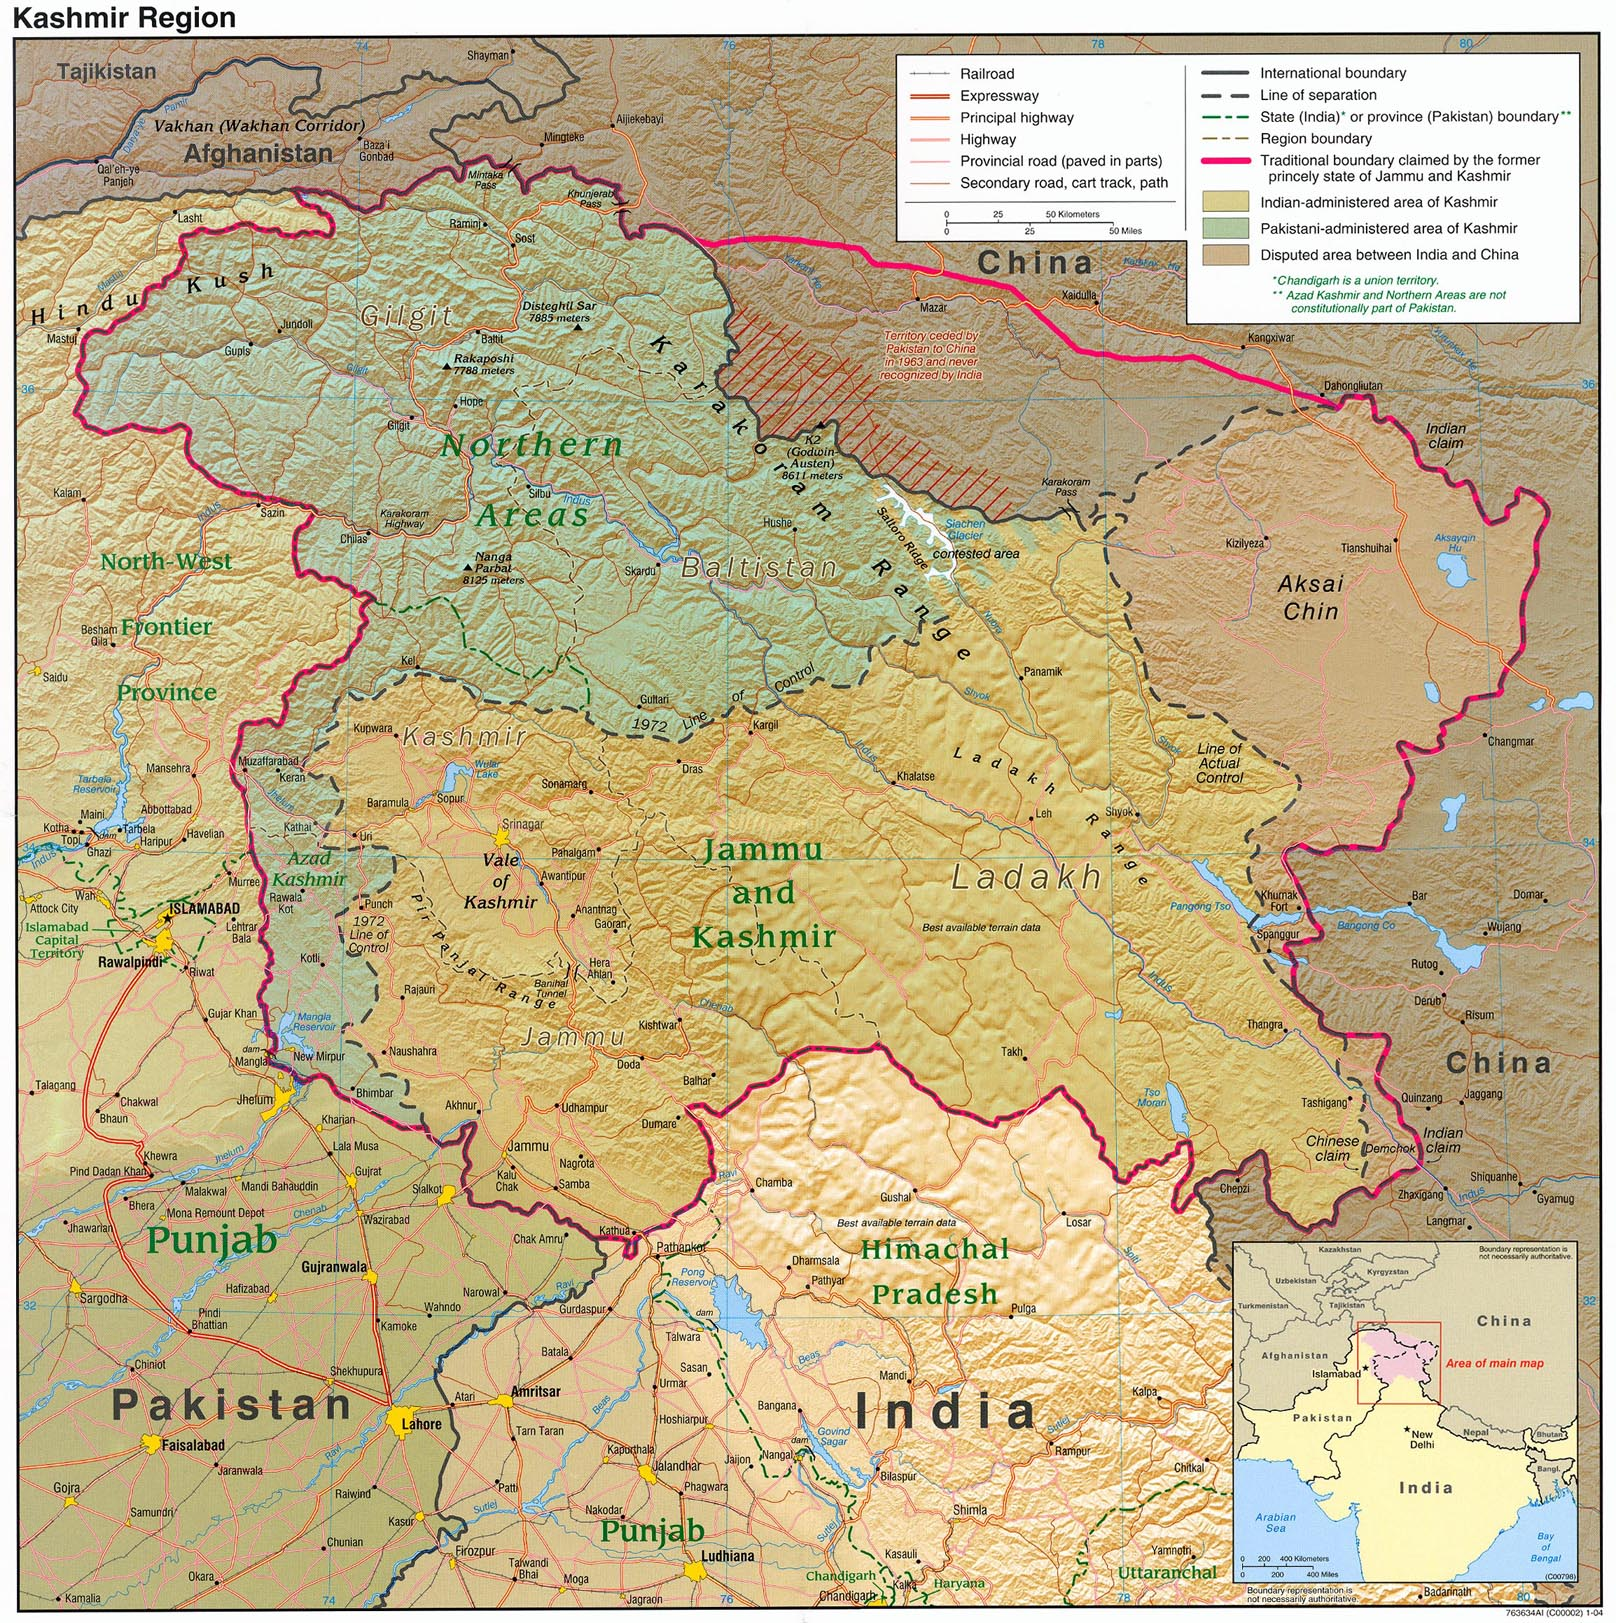 India - Maps - ecoi.net on poland map, thailand map, maharashtra map, croatia map, karnataka map, portugal map, italy map, spain map, malaysia map, australia map, argentina map, russia map, brazil map, china map, new zealand map, norway map, africa map, iceland map, andhra pradesh map, europe map, egypt map, cuba map, korea map, california map, cyprus map, greece map, indian subcontinent map, texas map, arabian sea map, germany map, sri lanka map, japan map, time zone map, canada map, czech republic map, france map, ireland map,